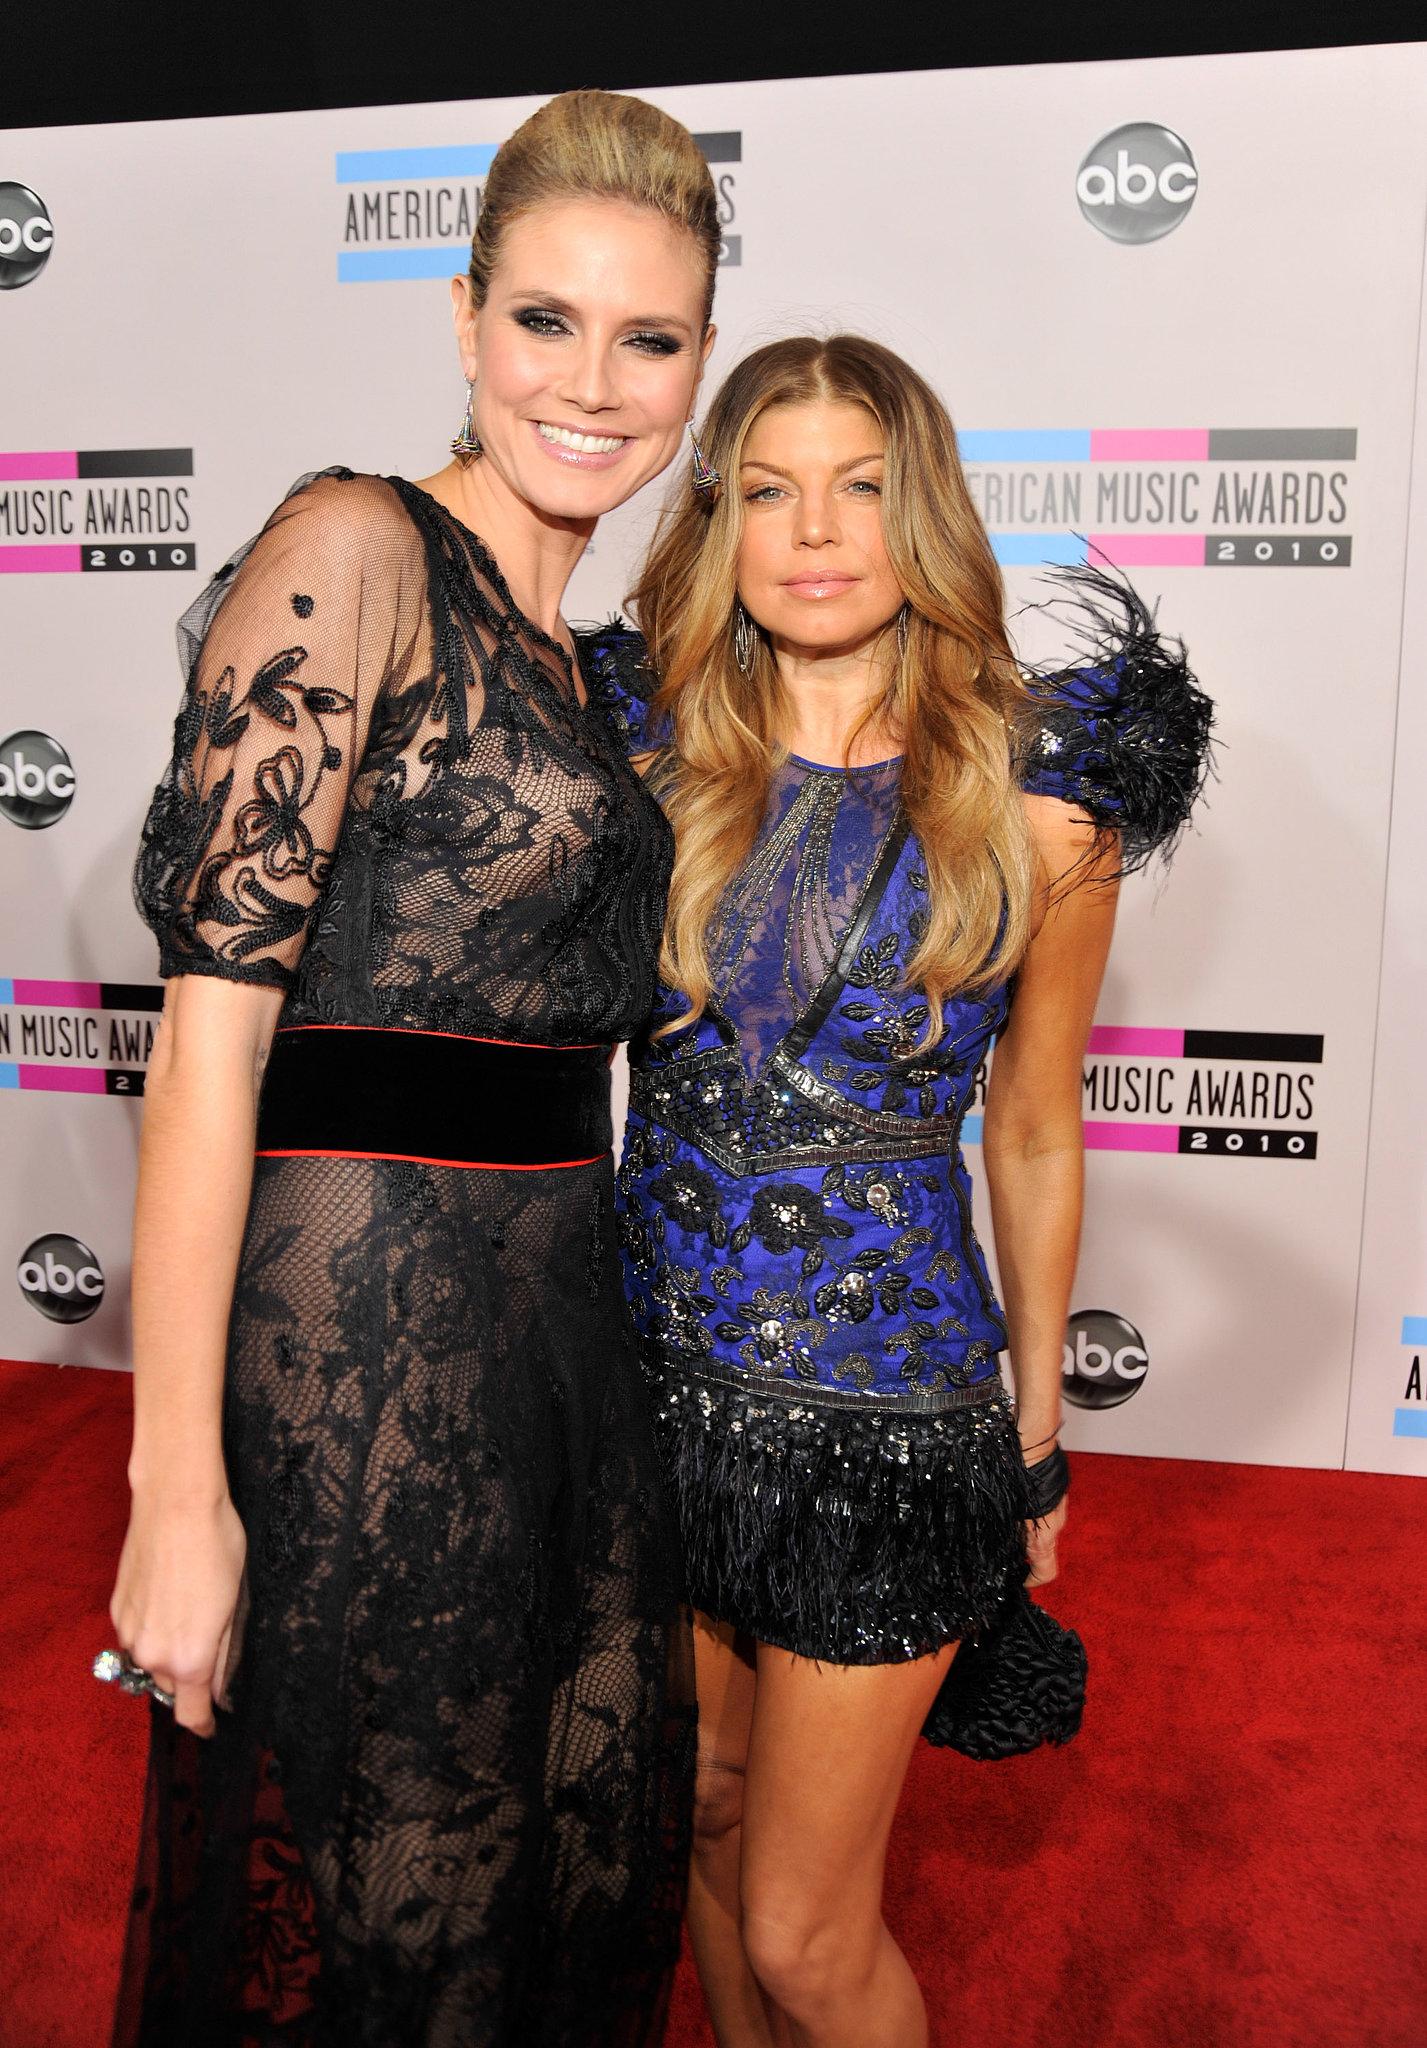 Heidi Klum and Fergie got close on the red carpet in 2010.